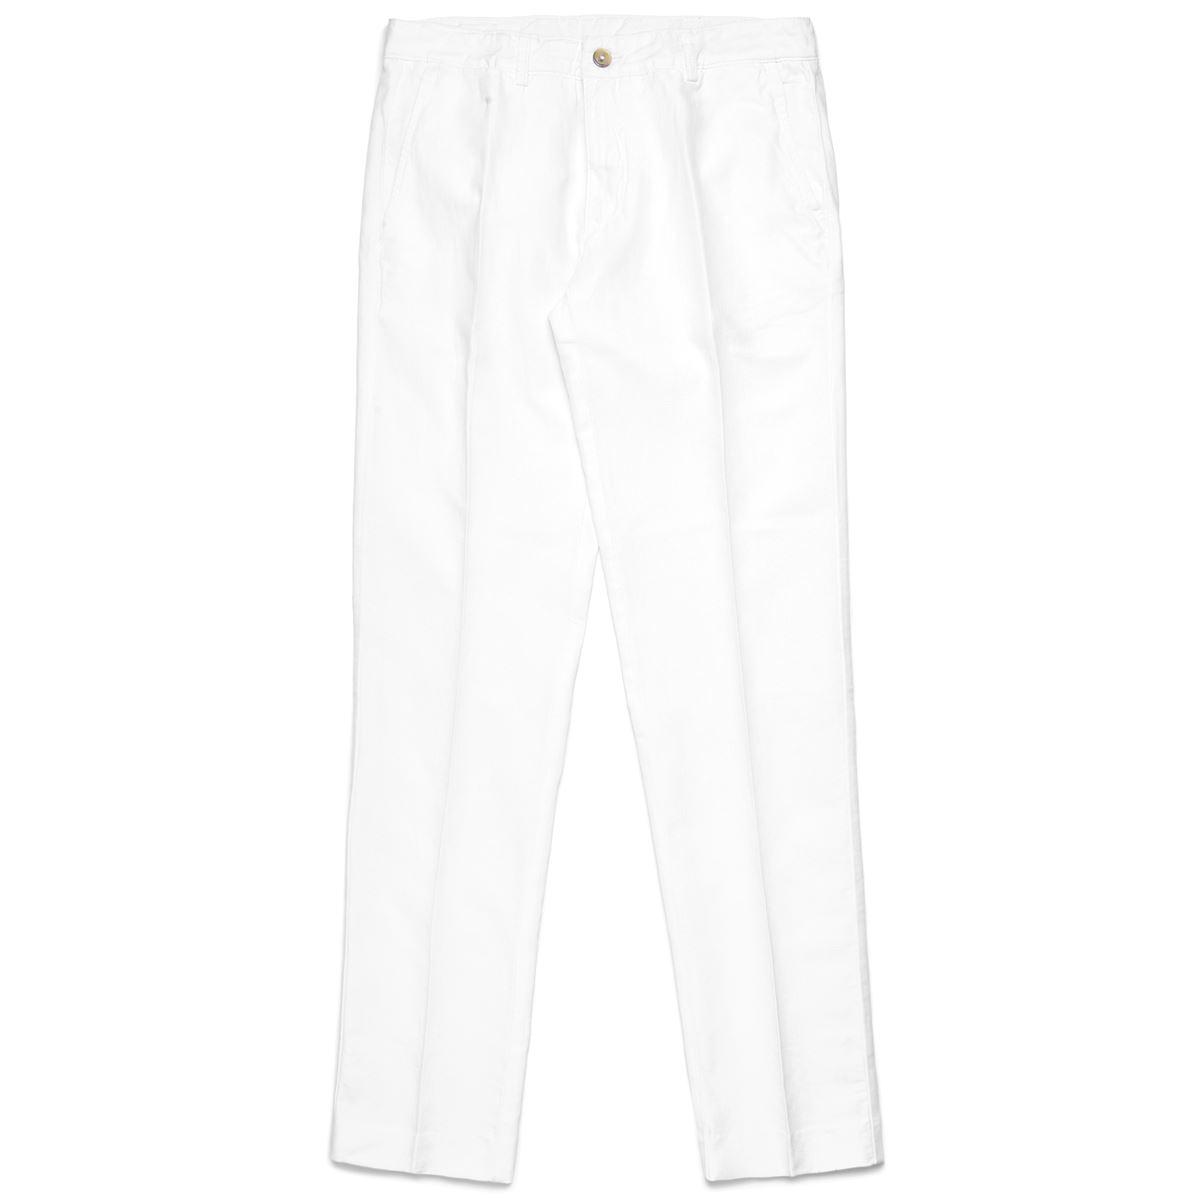 Robe di Kappa Pantaloni uomo-601M9B0